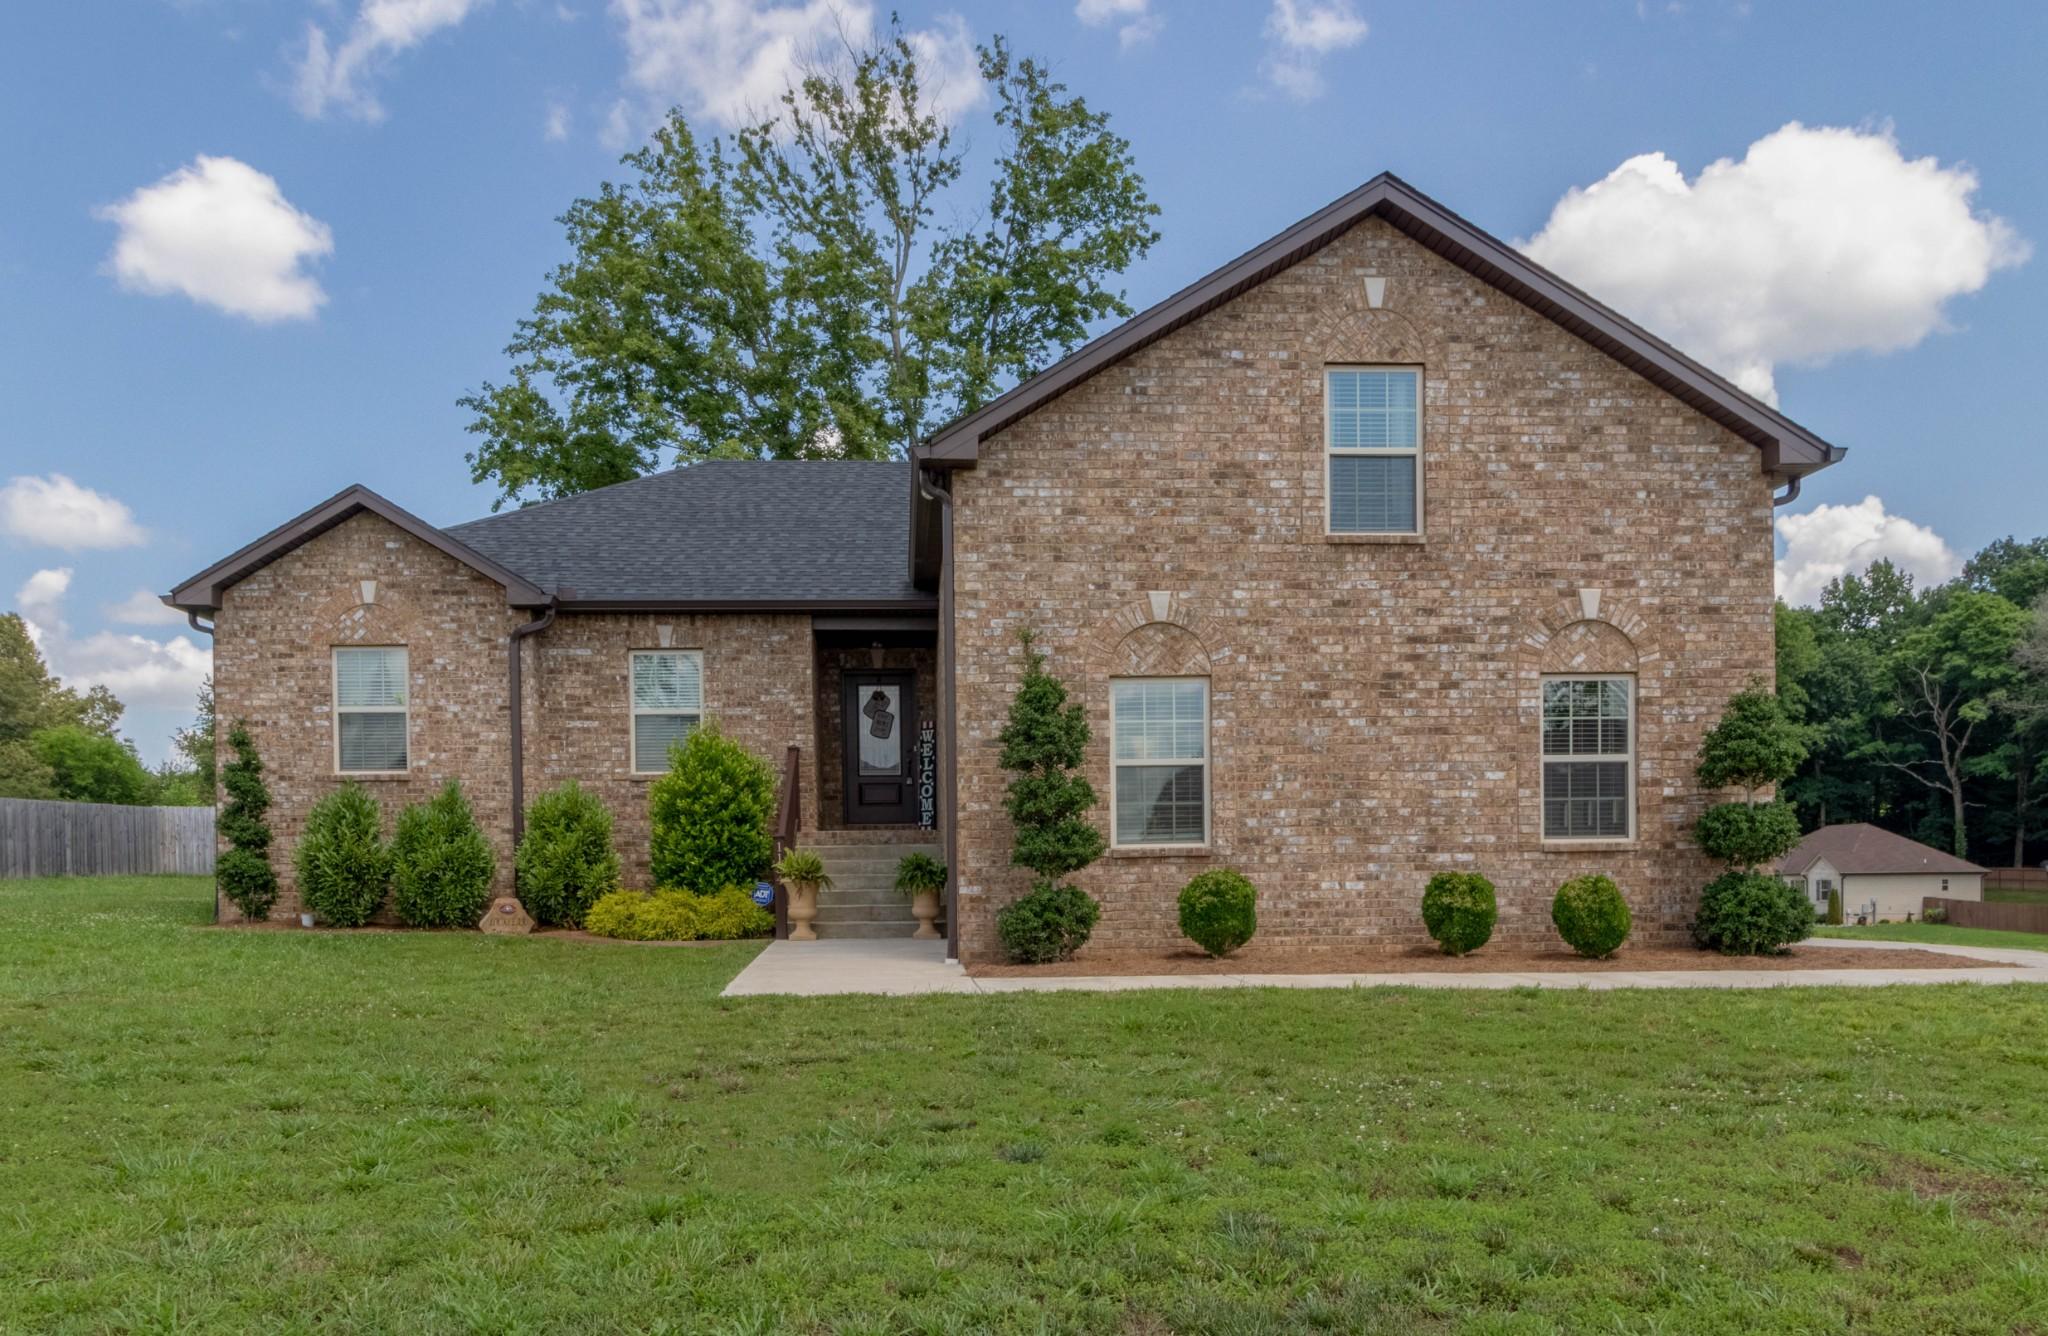 1154 Bonnie Ln Property Photo - Cross Plains, TN real estate listing